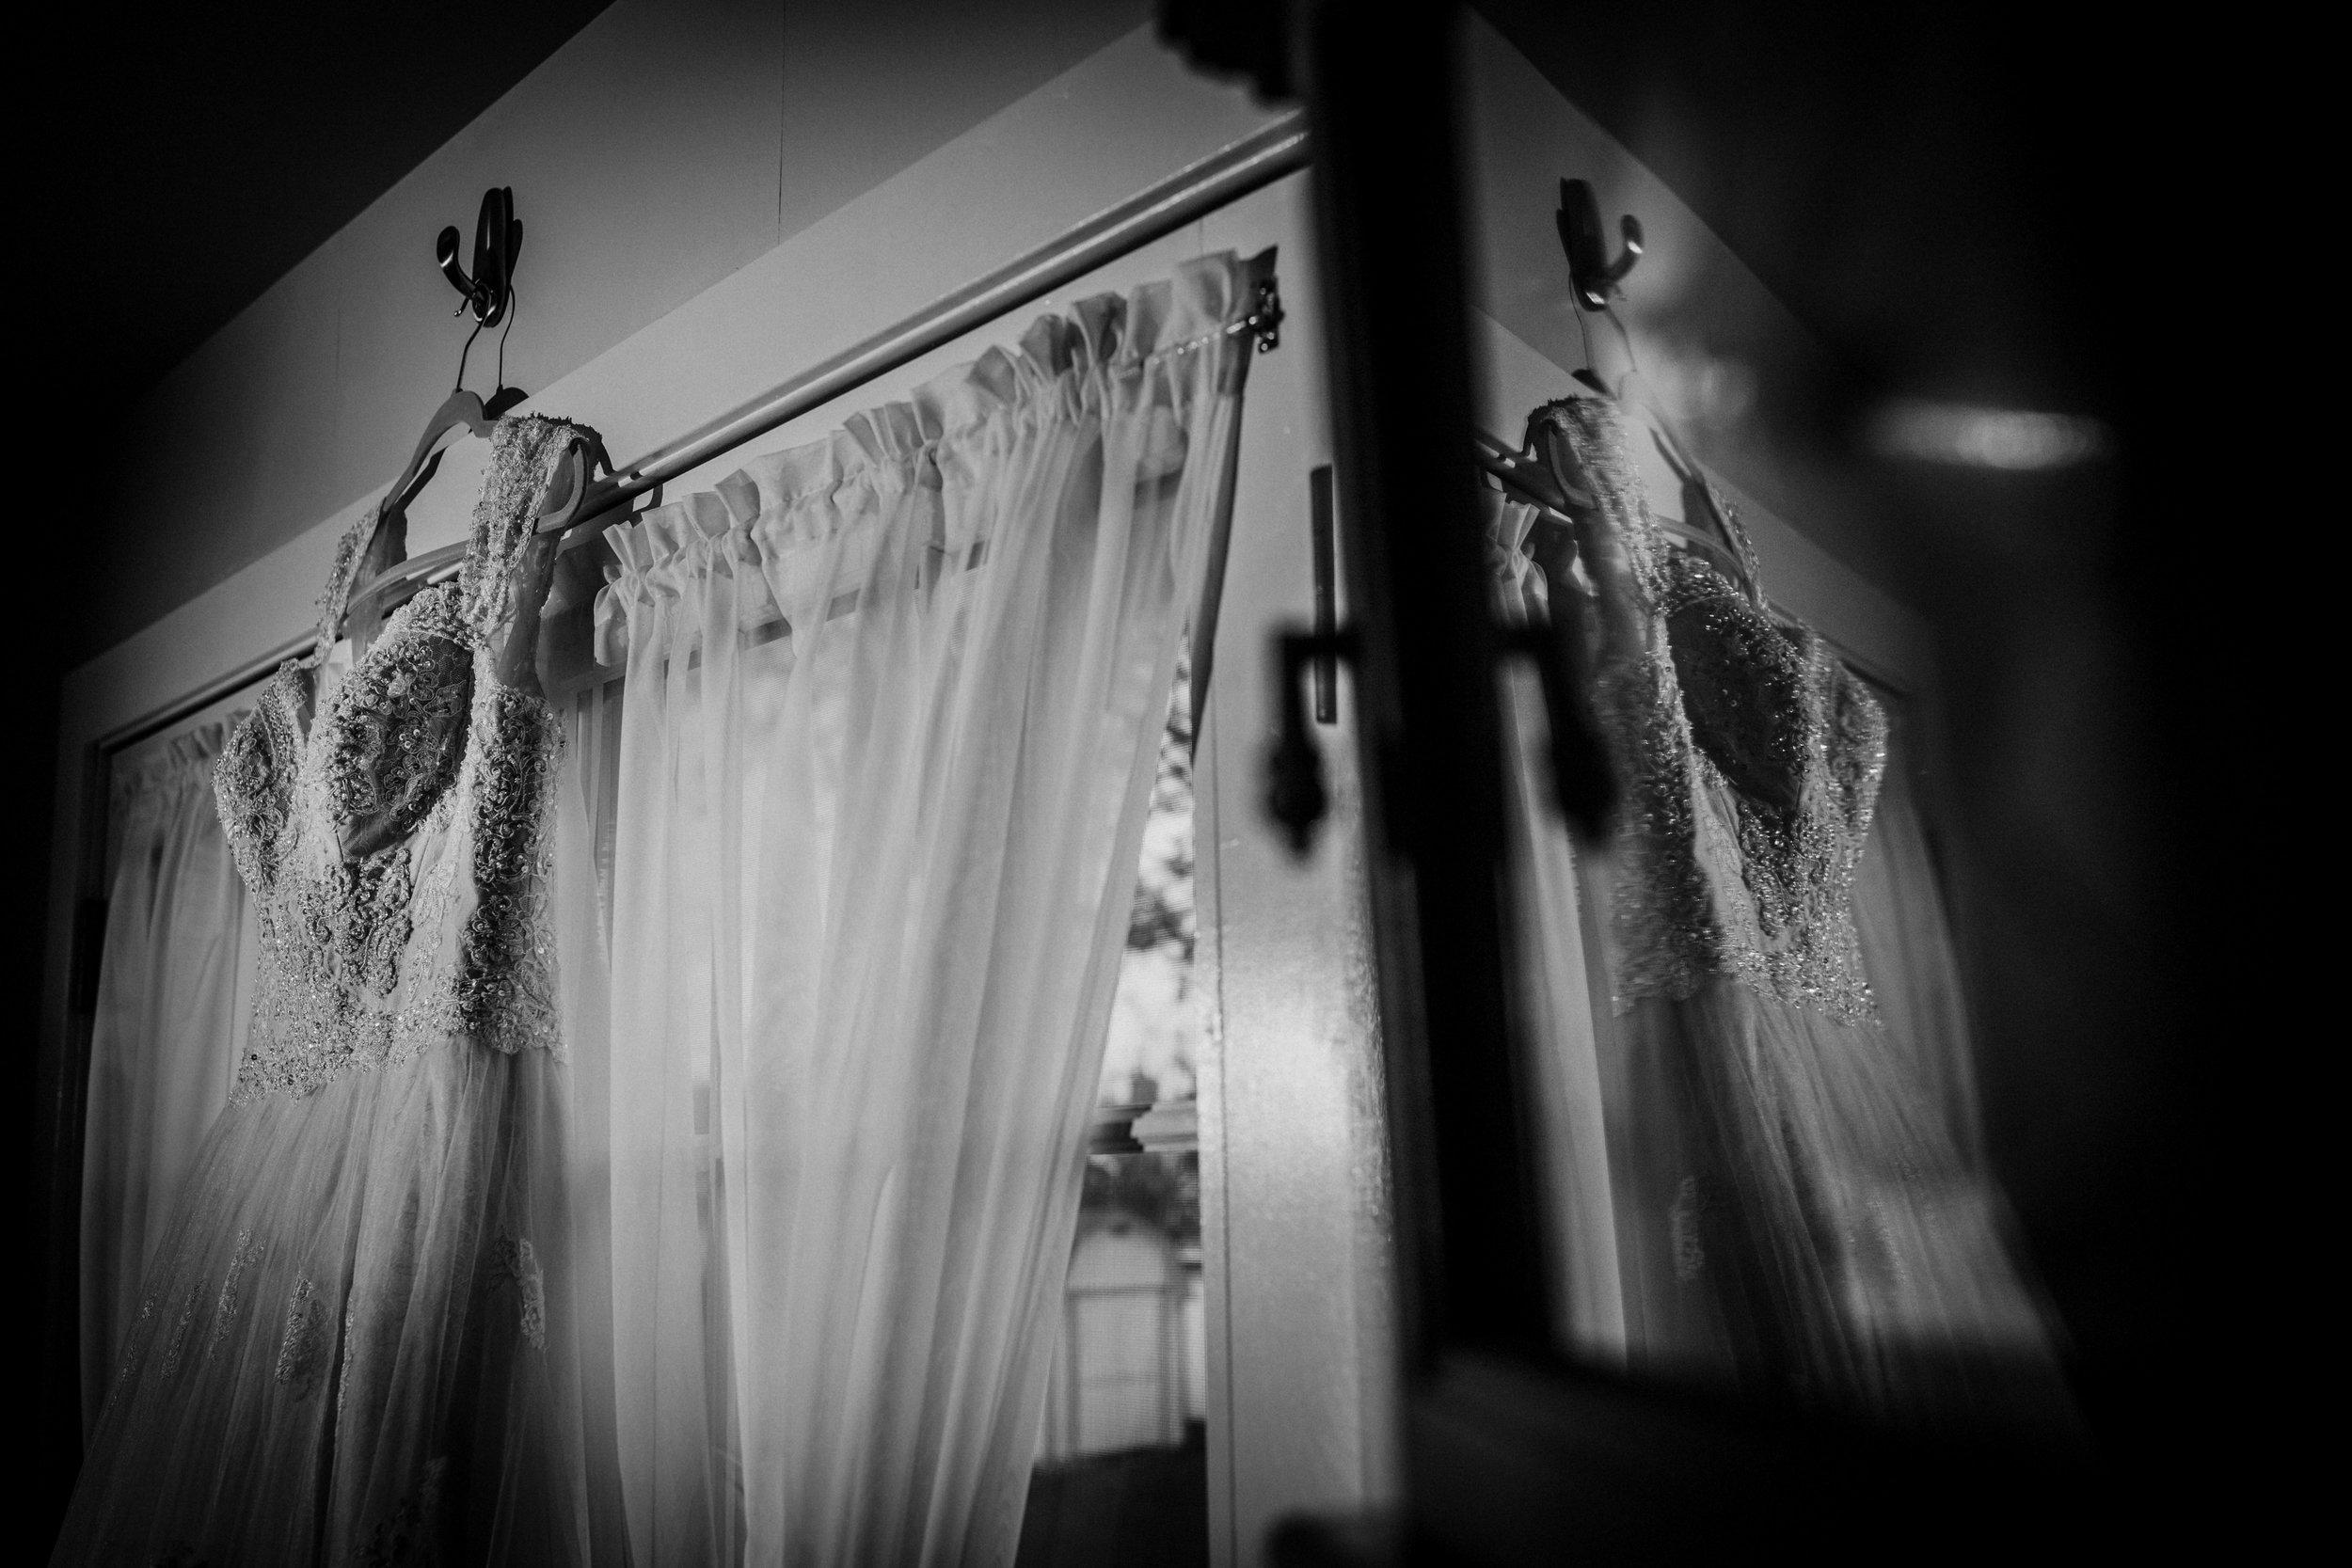 New-Jersey-Wedding-Photography-Fishers-Tudor-House-JennaLynnPhotography-DetailsBW-Kathleen&Eddie-9.jpg